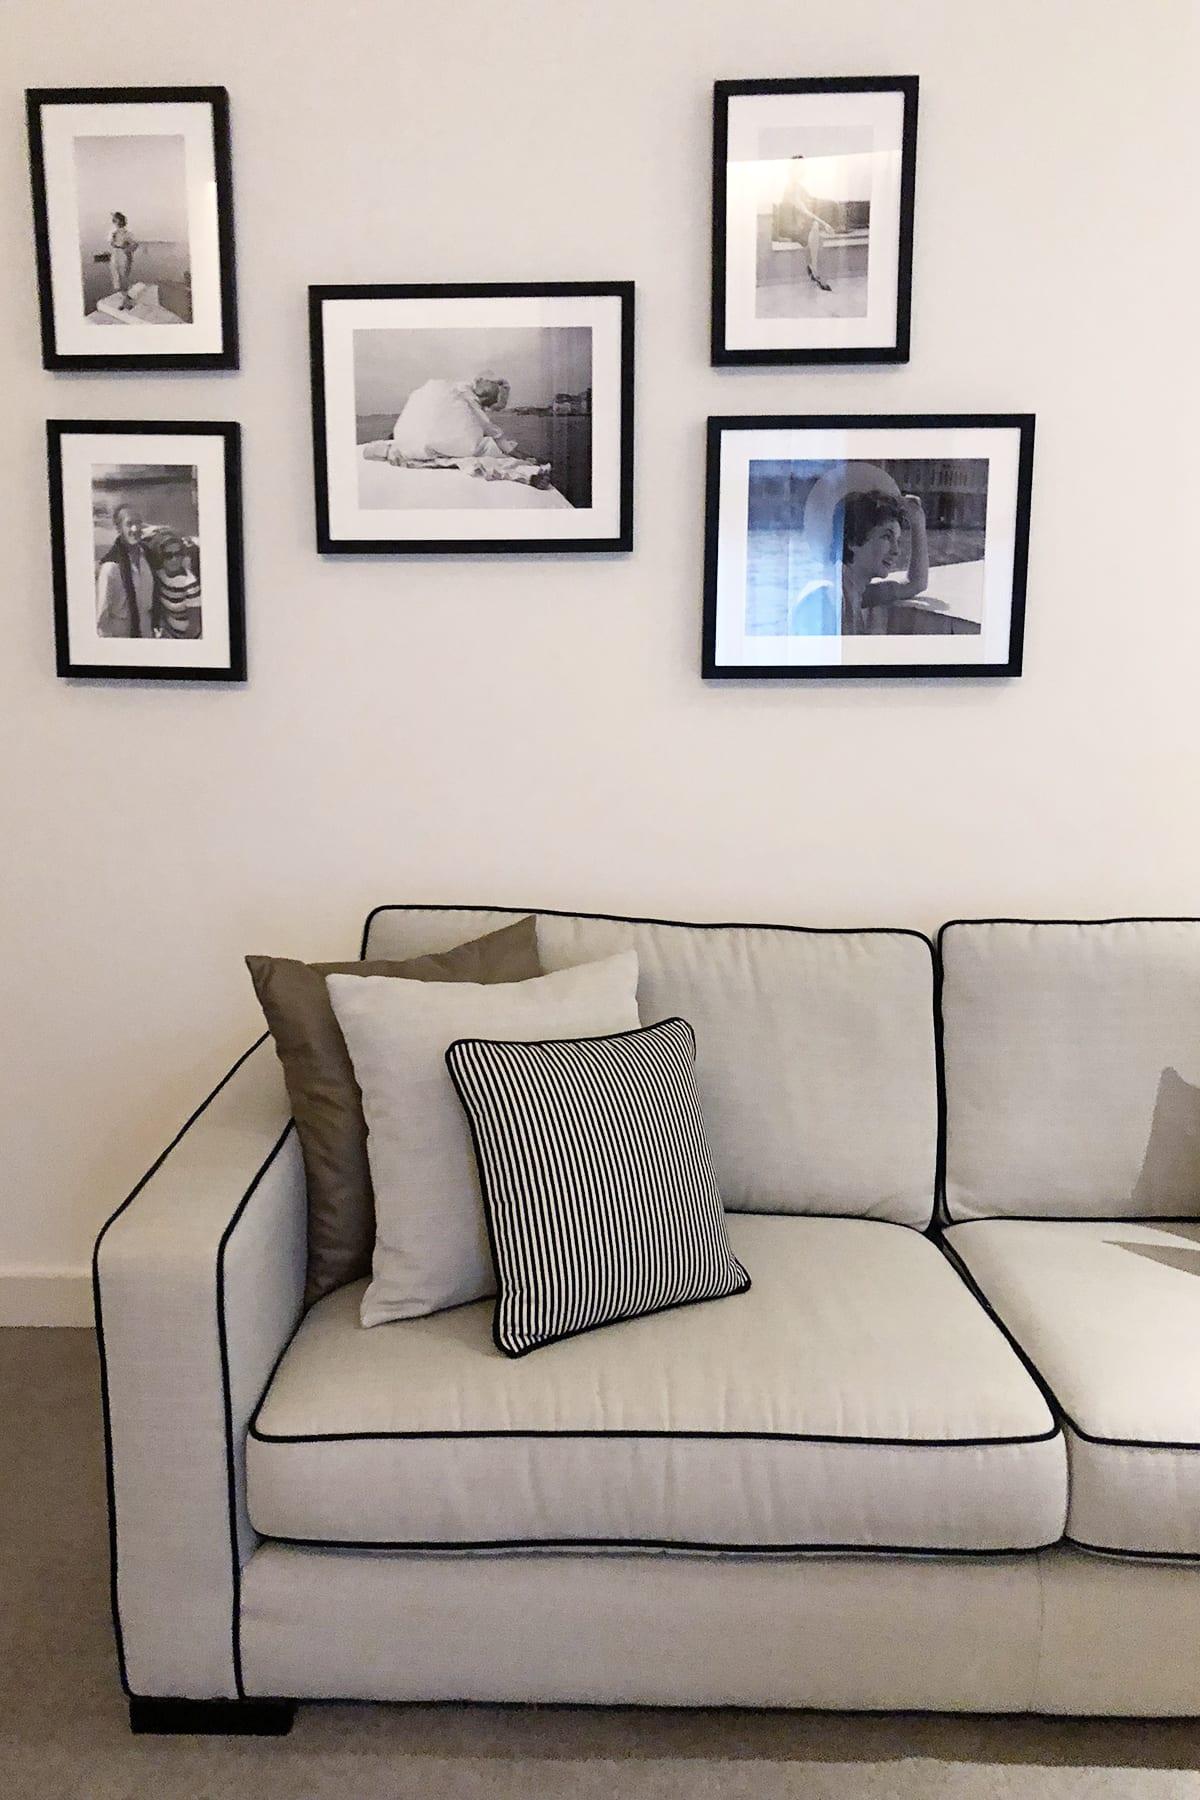 Jw marriott venice italy guest suite